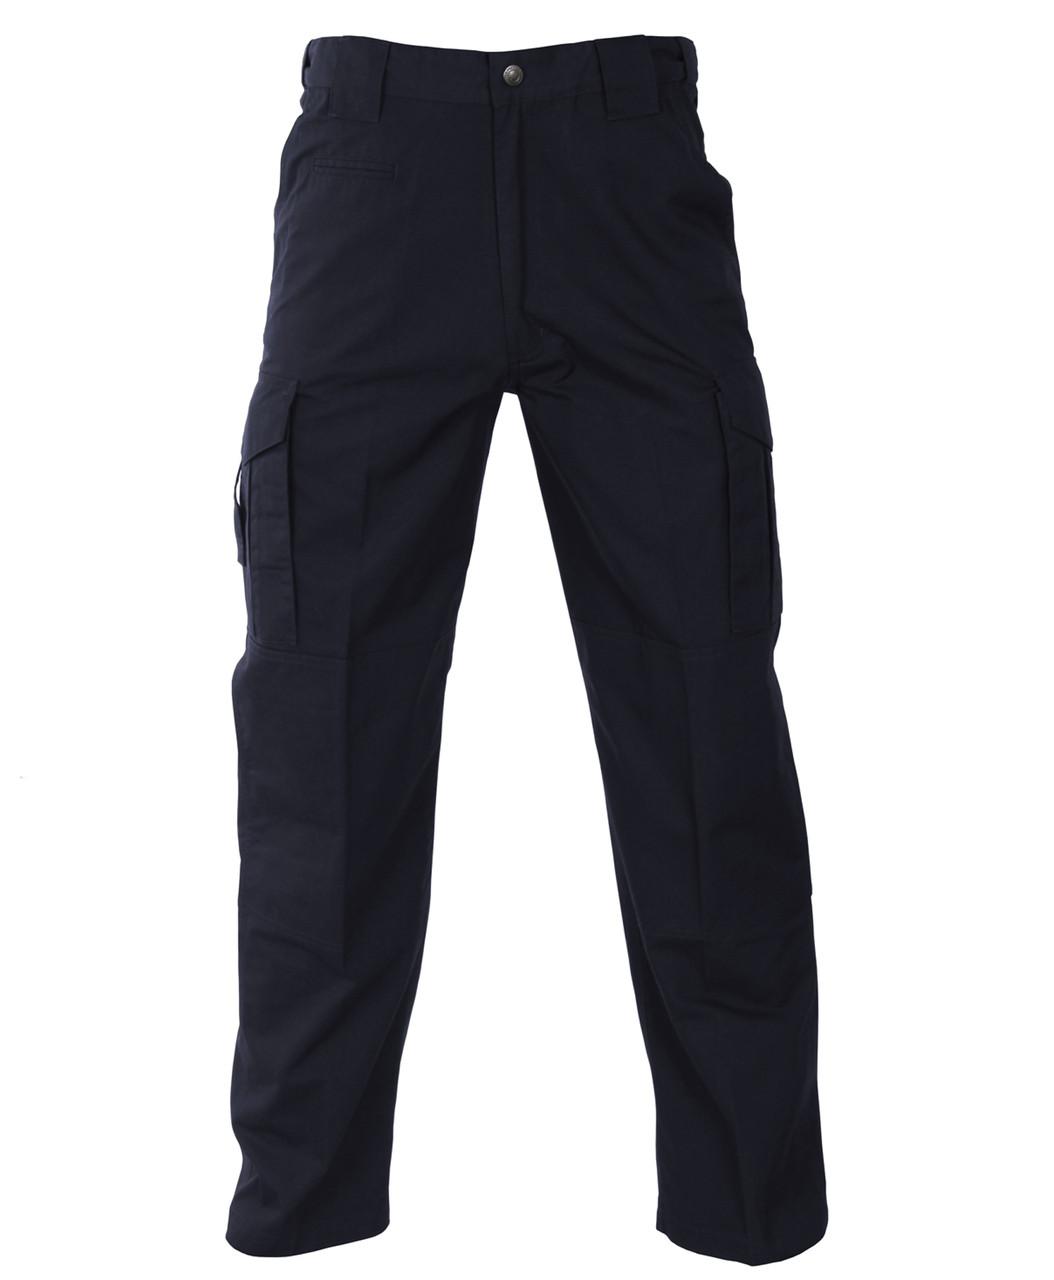 7e559a3254517 CriticalResponse™ EMS Pants - Women's